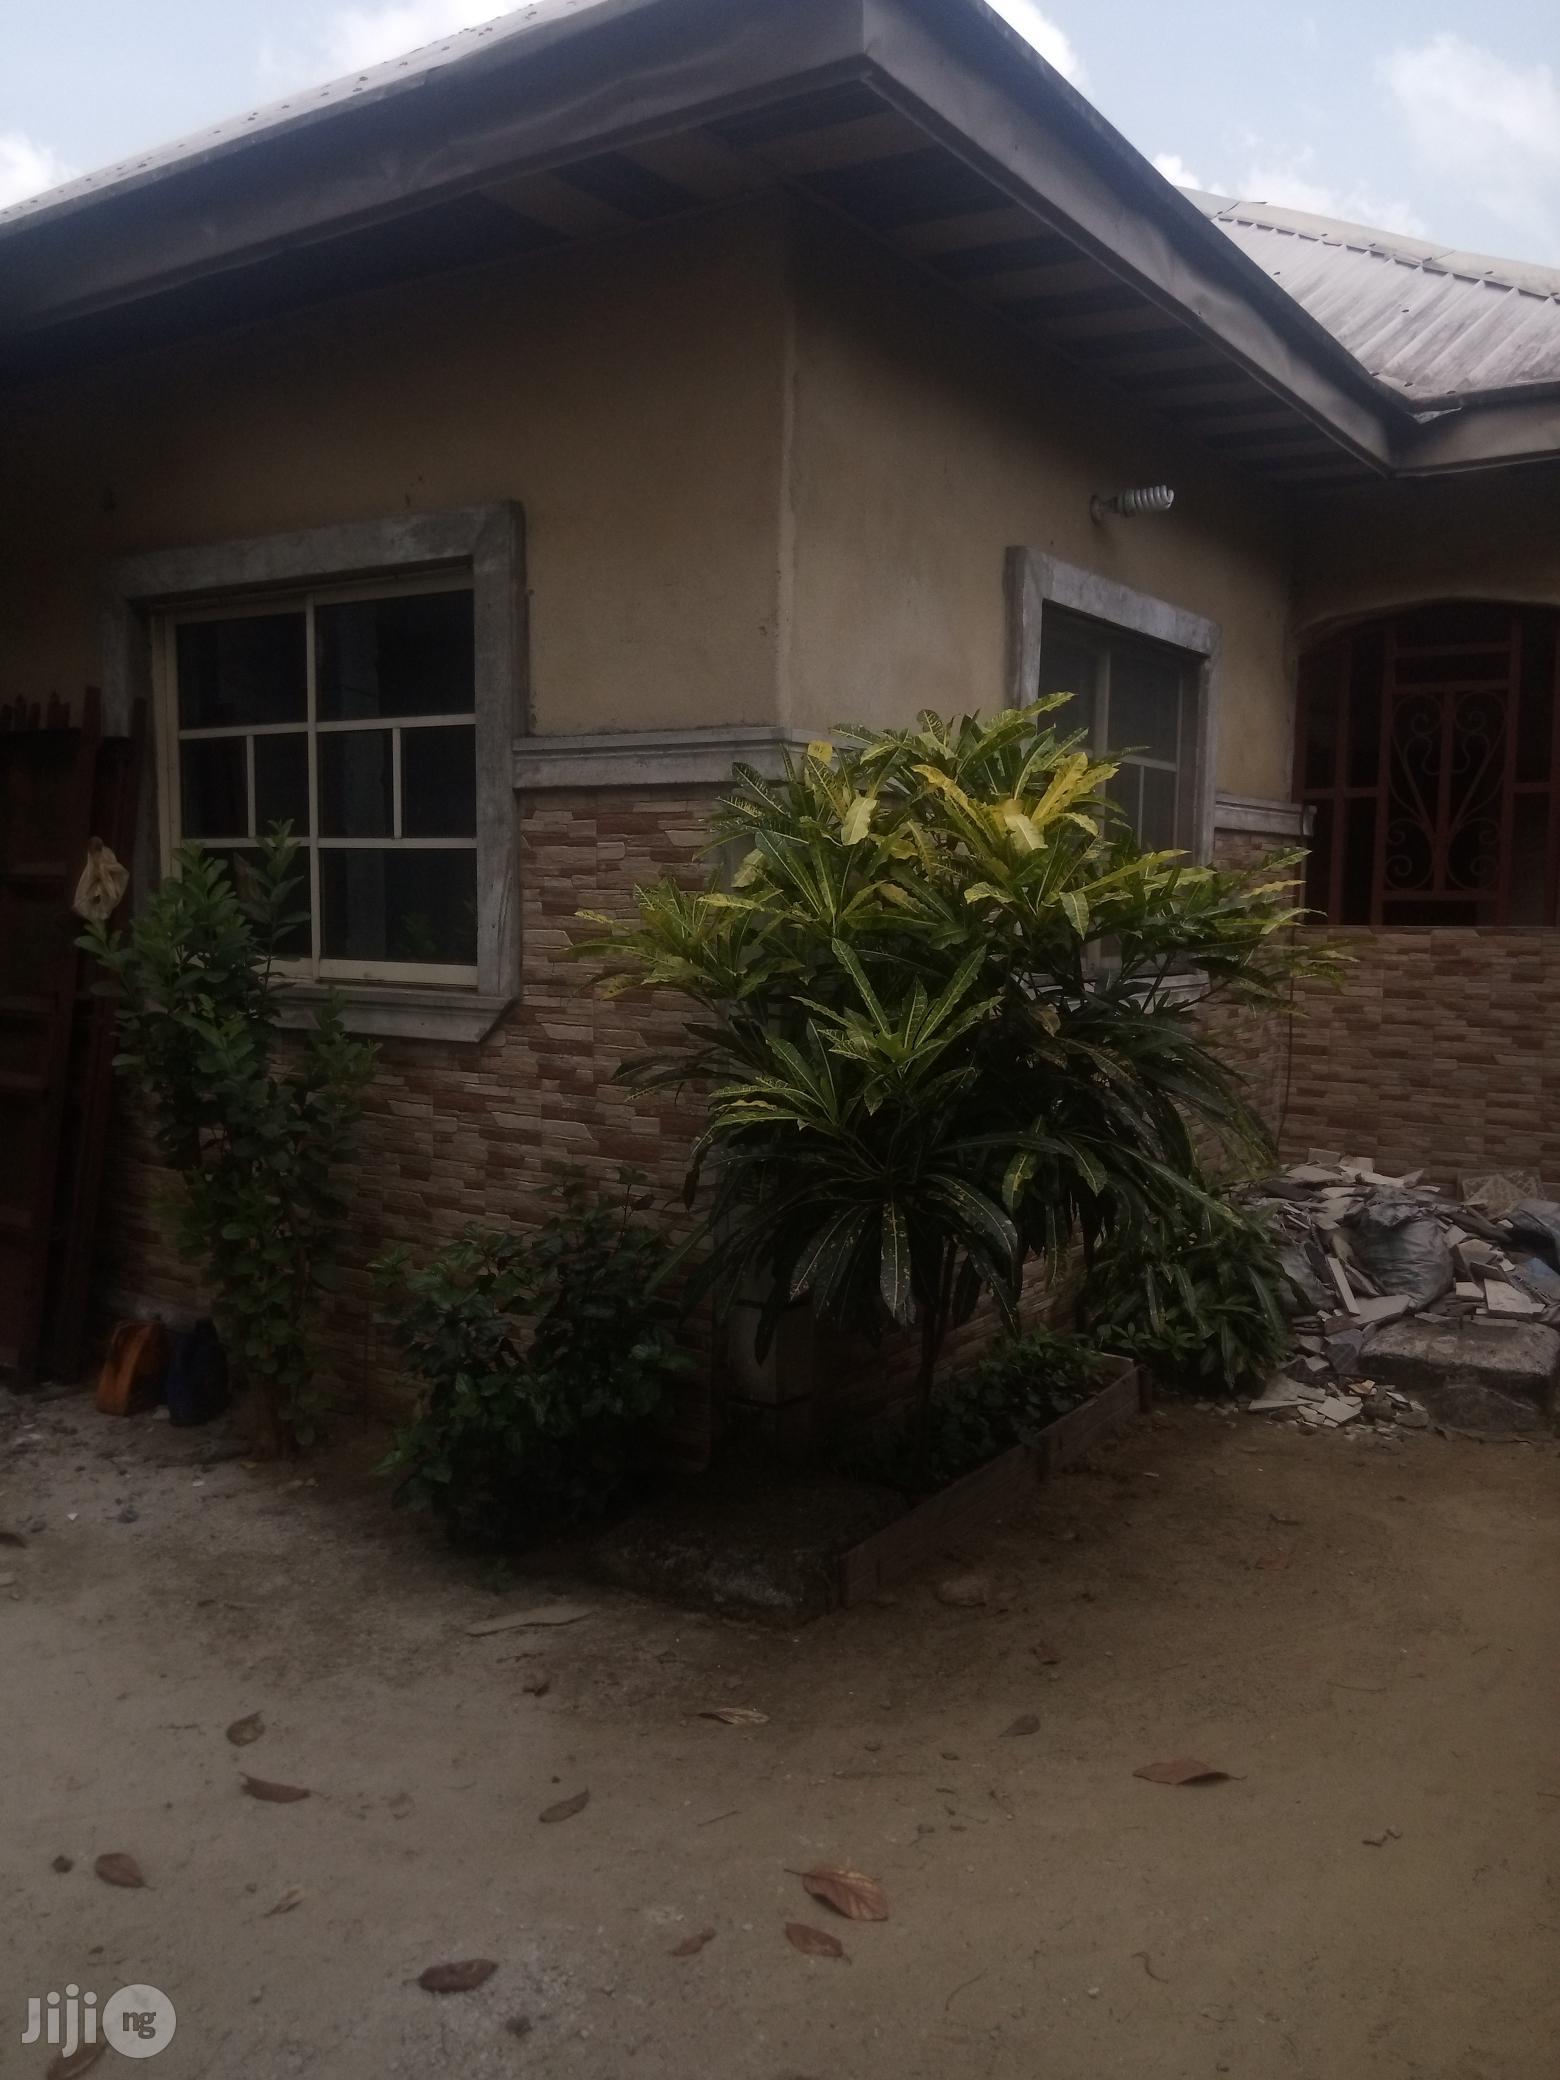 A Beautiful 3 Bedroom Flat Rupokwu, Port Harcourt For Sale